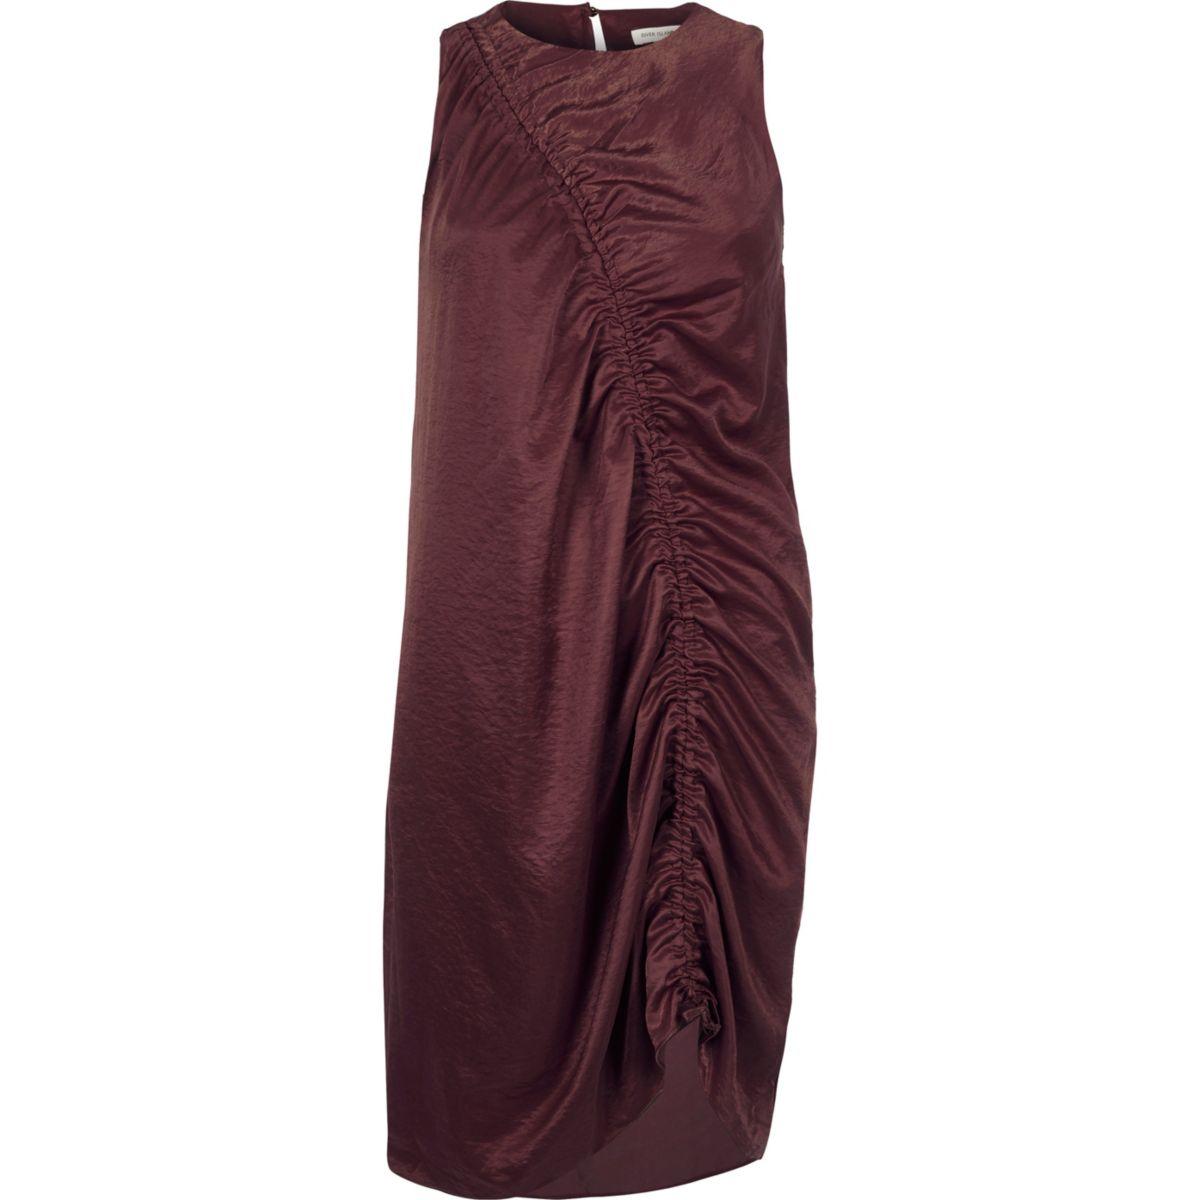 Dark purple ruched front sleeveless dress